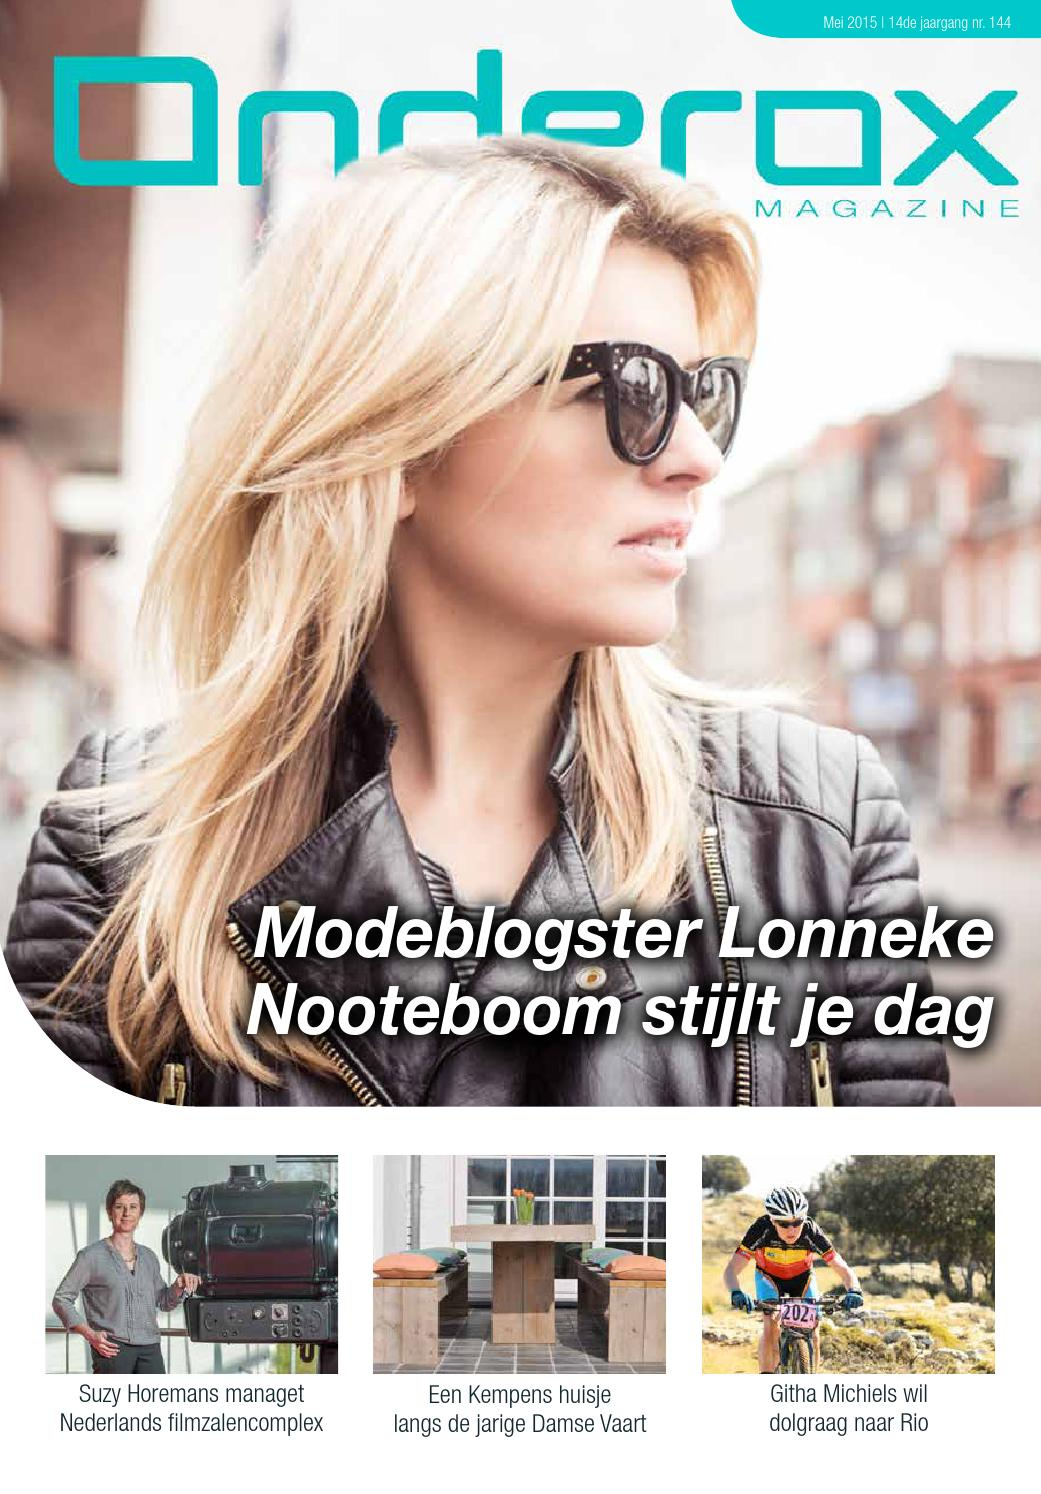 Onderox mei 2015 by de heuvel uitgeverij   issuu